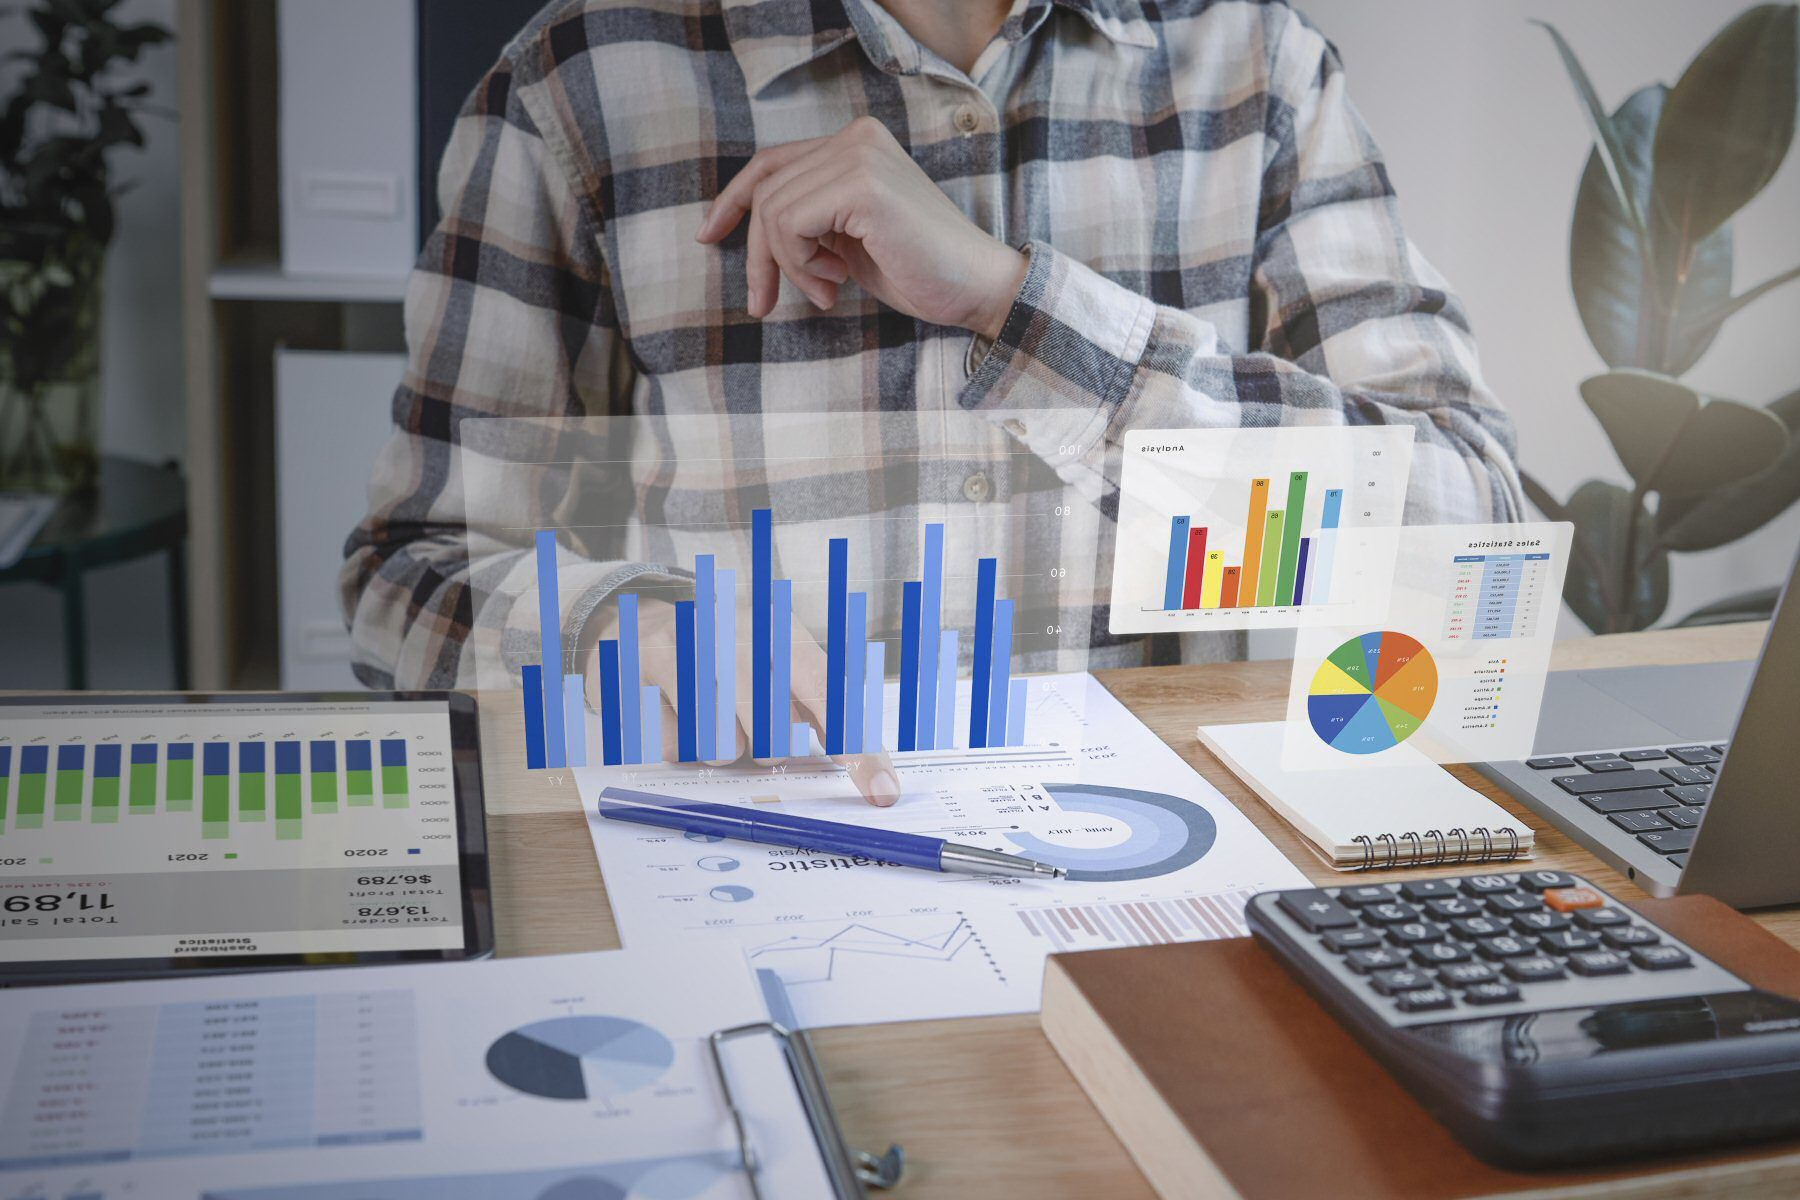 Digital Transformation: Accounting Software